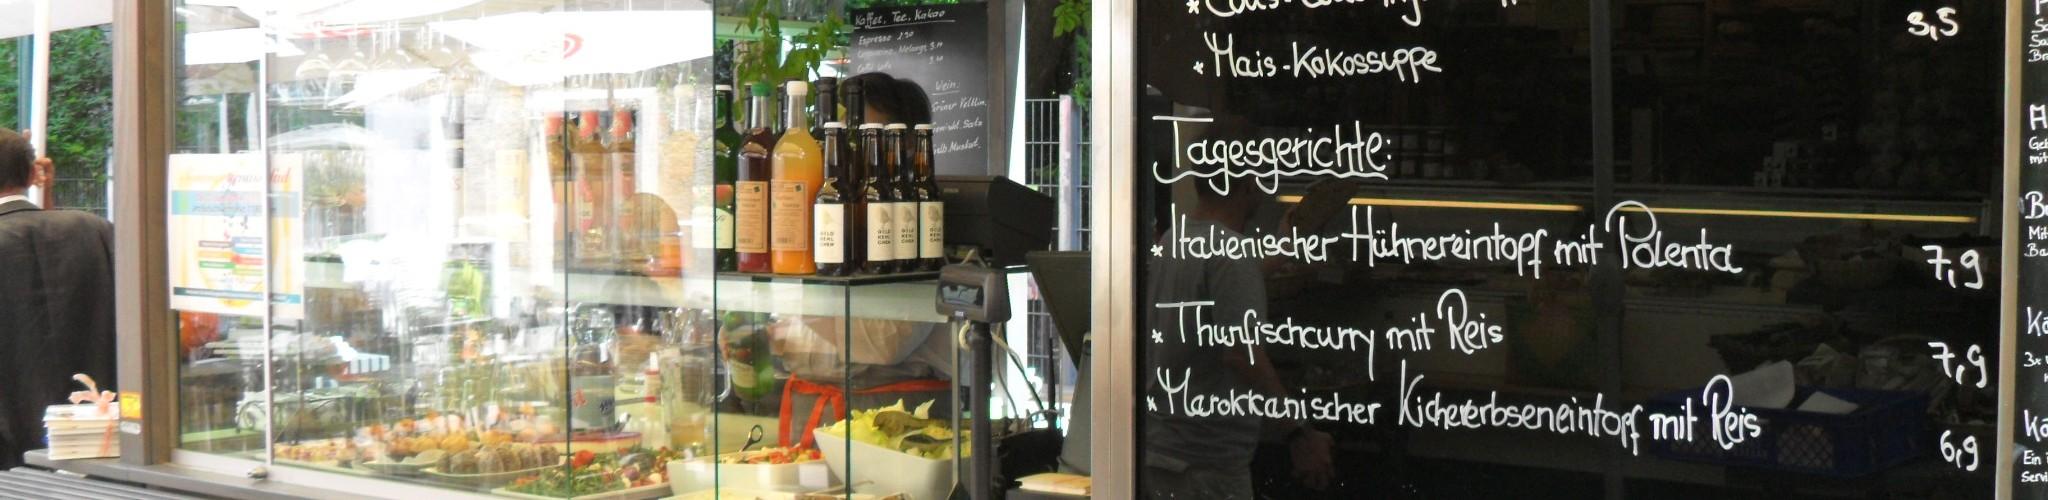 Kutschkermarkt: Pöhl's Cantine